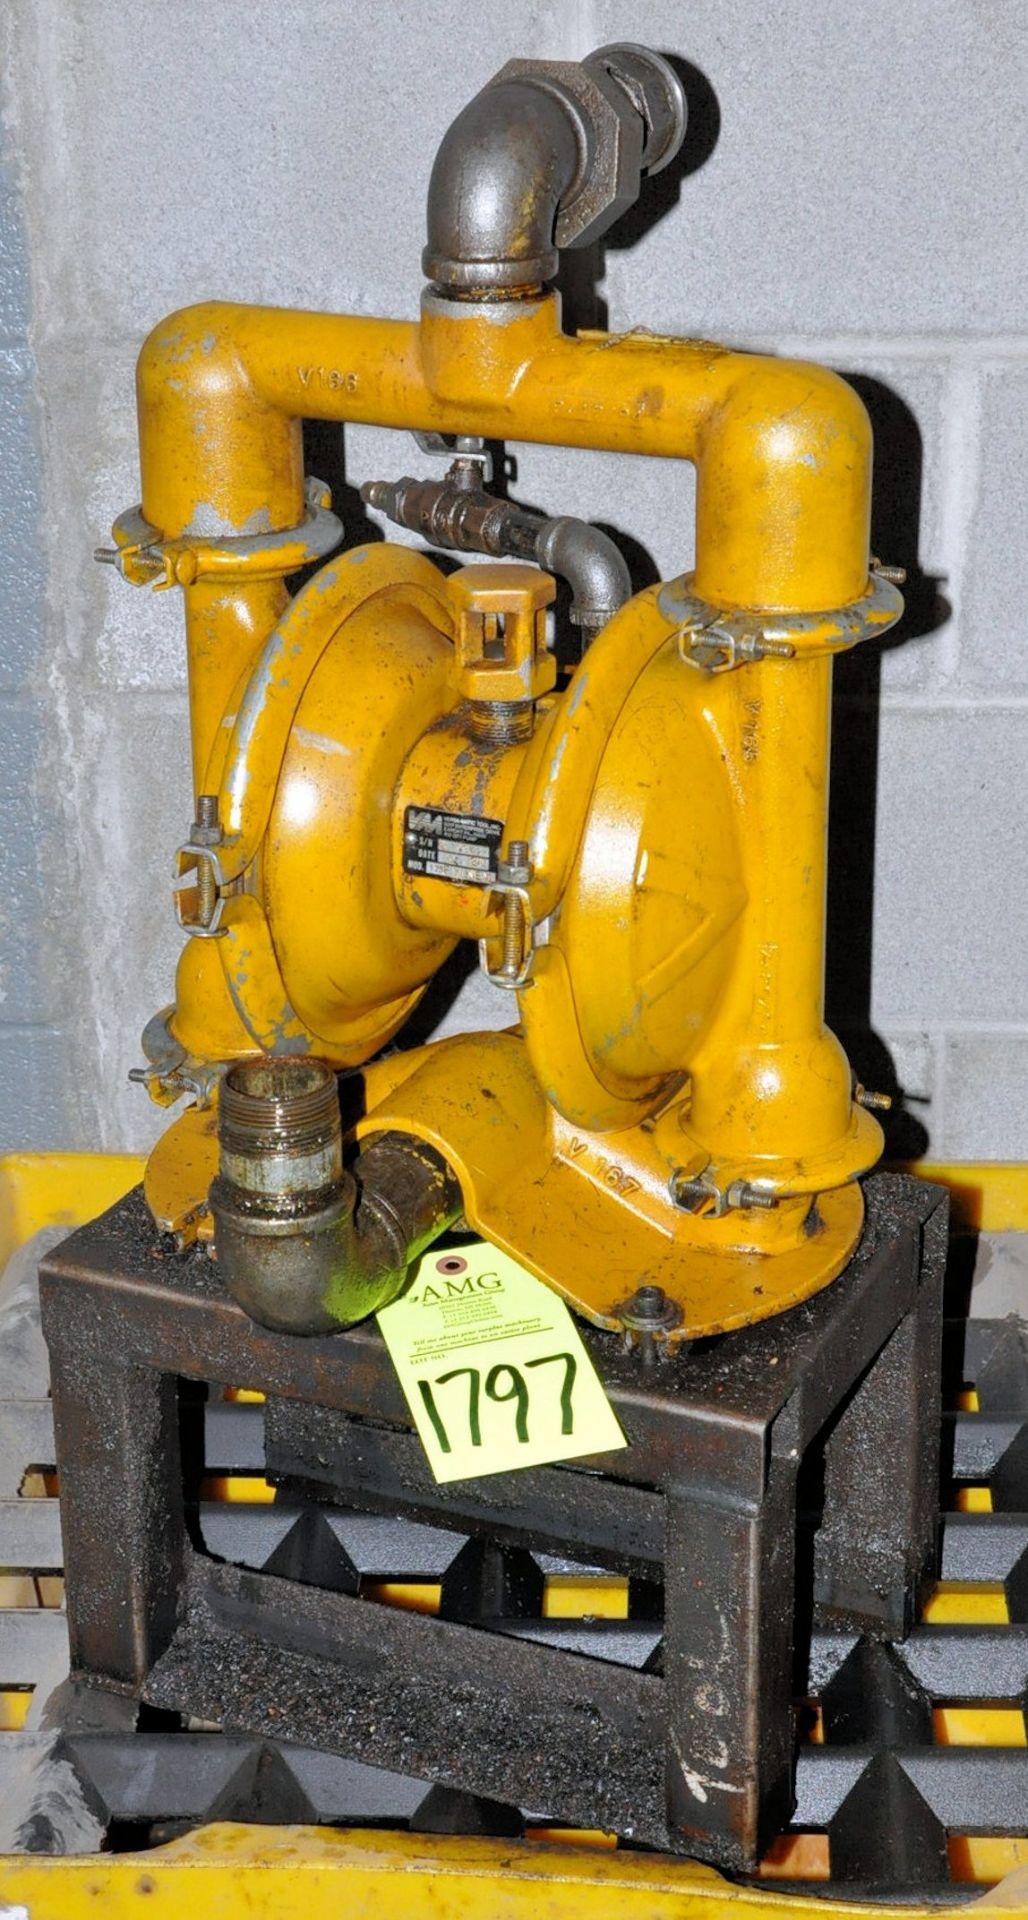 Lot-(3) Versamatic Pneumatic Fluids Pumps, (Oils Storage Building), (Yellow Tag)